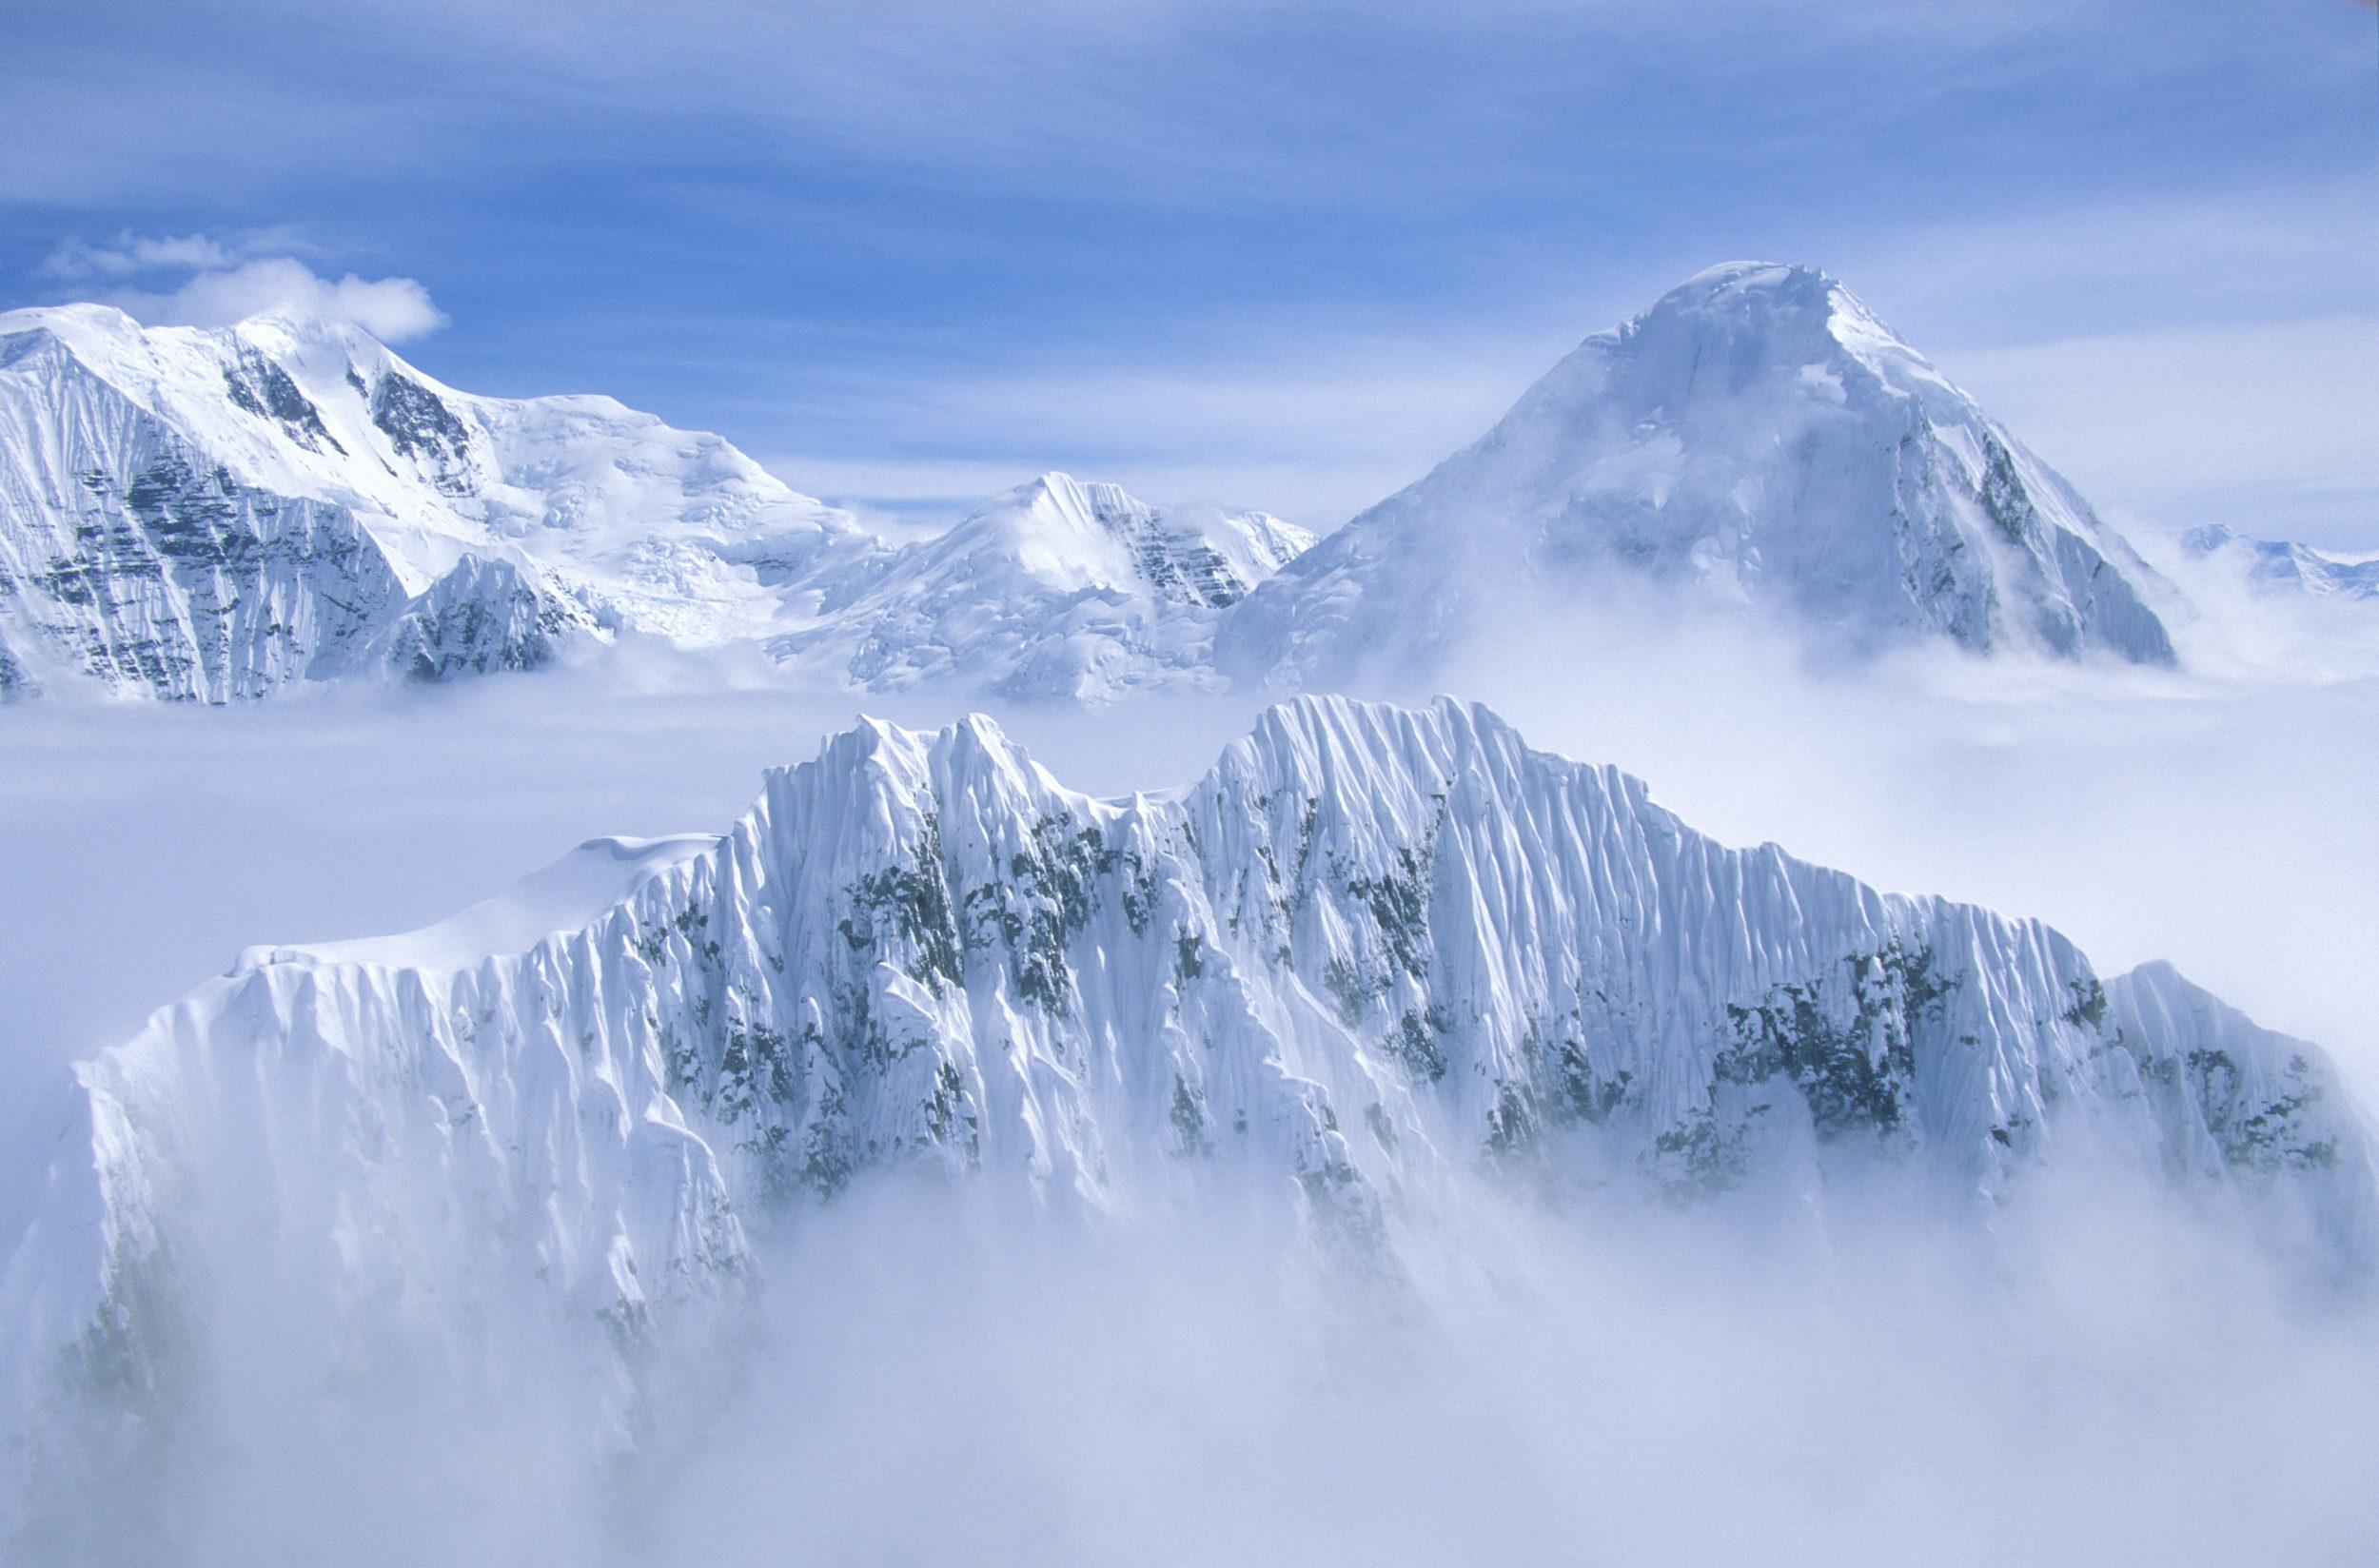 THE MOUNTAIN PEAKS OF WRANGELL-ST. ELIAS NATIONAL PARK -(PHOTO: JOSEPH SOHM/SHUTTERSTOCK)